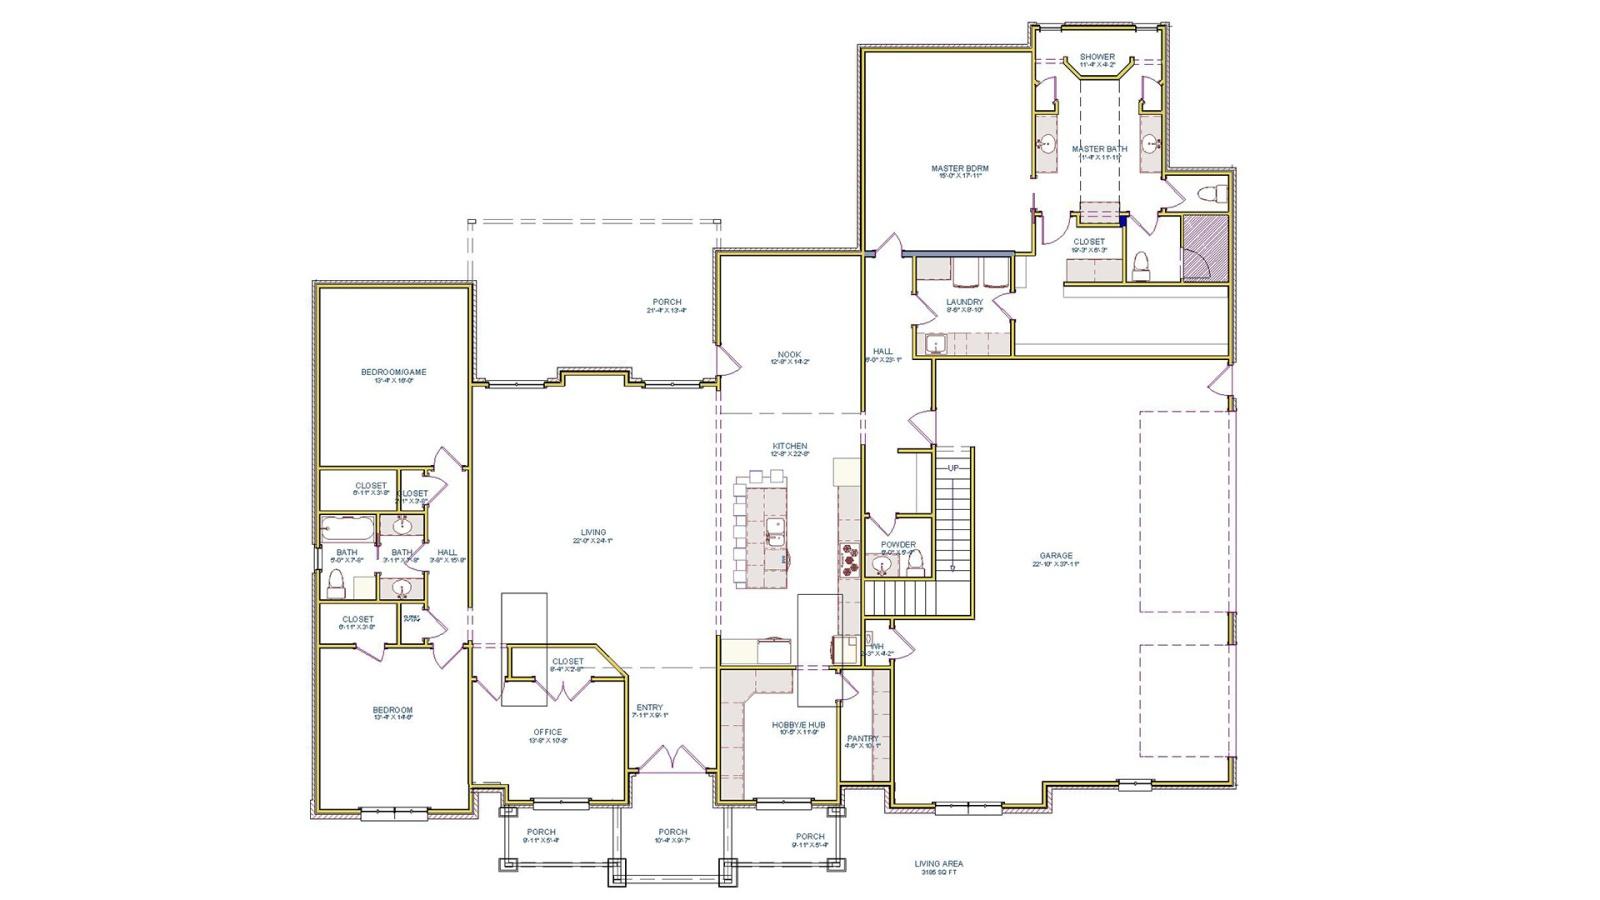 3 Bedrooms Bedrooms, ,3 BathroomsBathrooms,Custom Home,Home Plans,1058